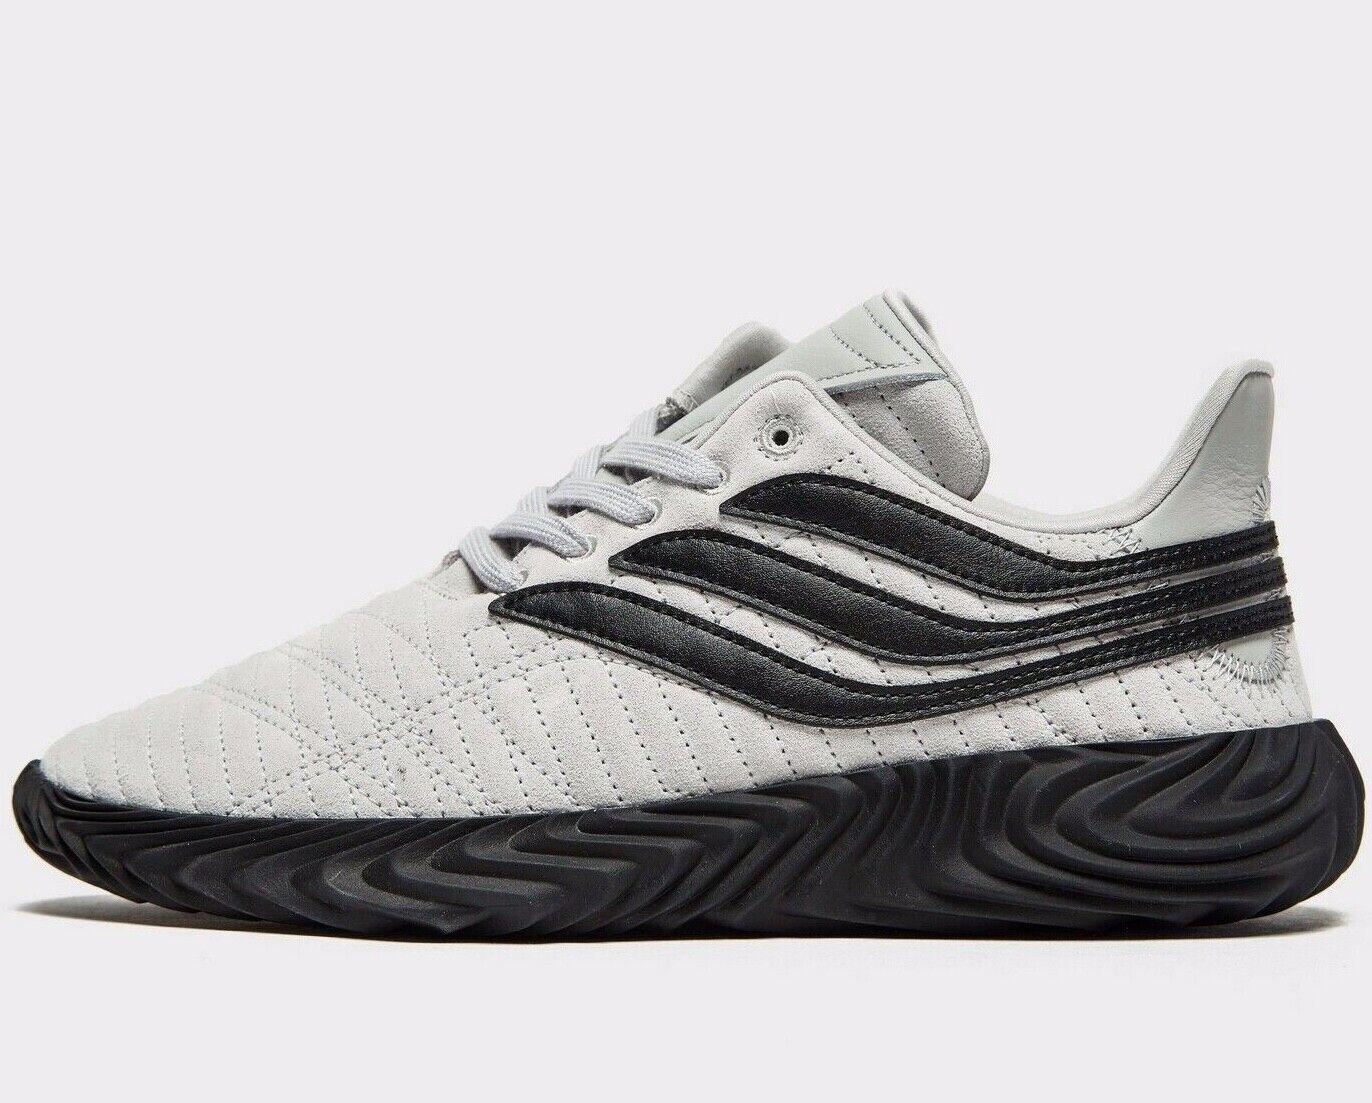 ⚫⚫ 2019 Genuine Adidas Originals SOBAKOV ® ( Men UK Sizes: 6 12 ) Grey Black